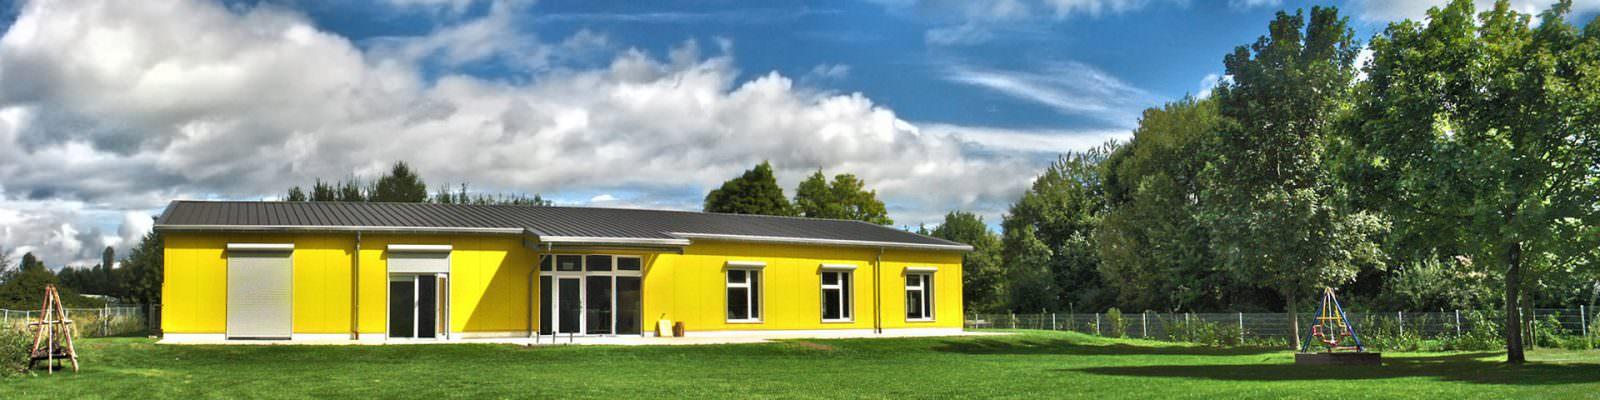 FCG Germersheim - Gebäude